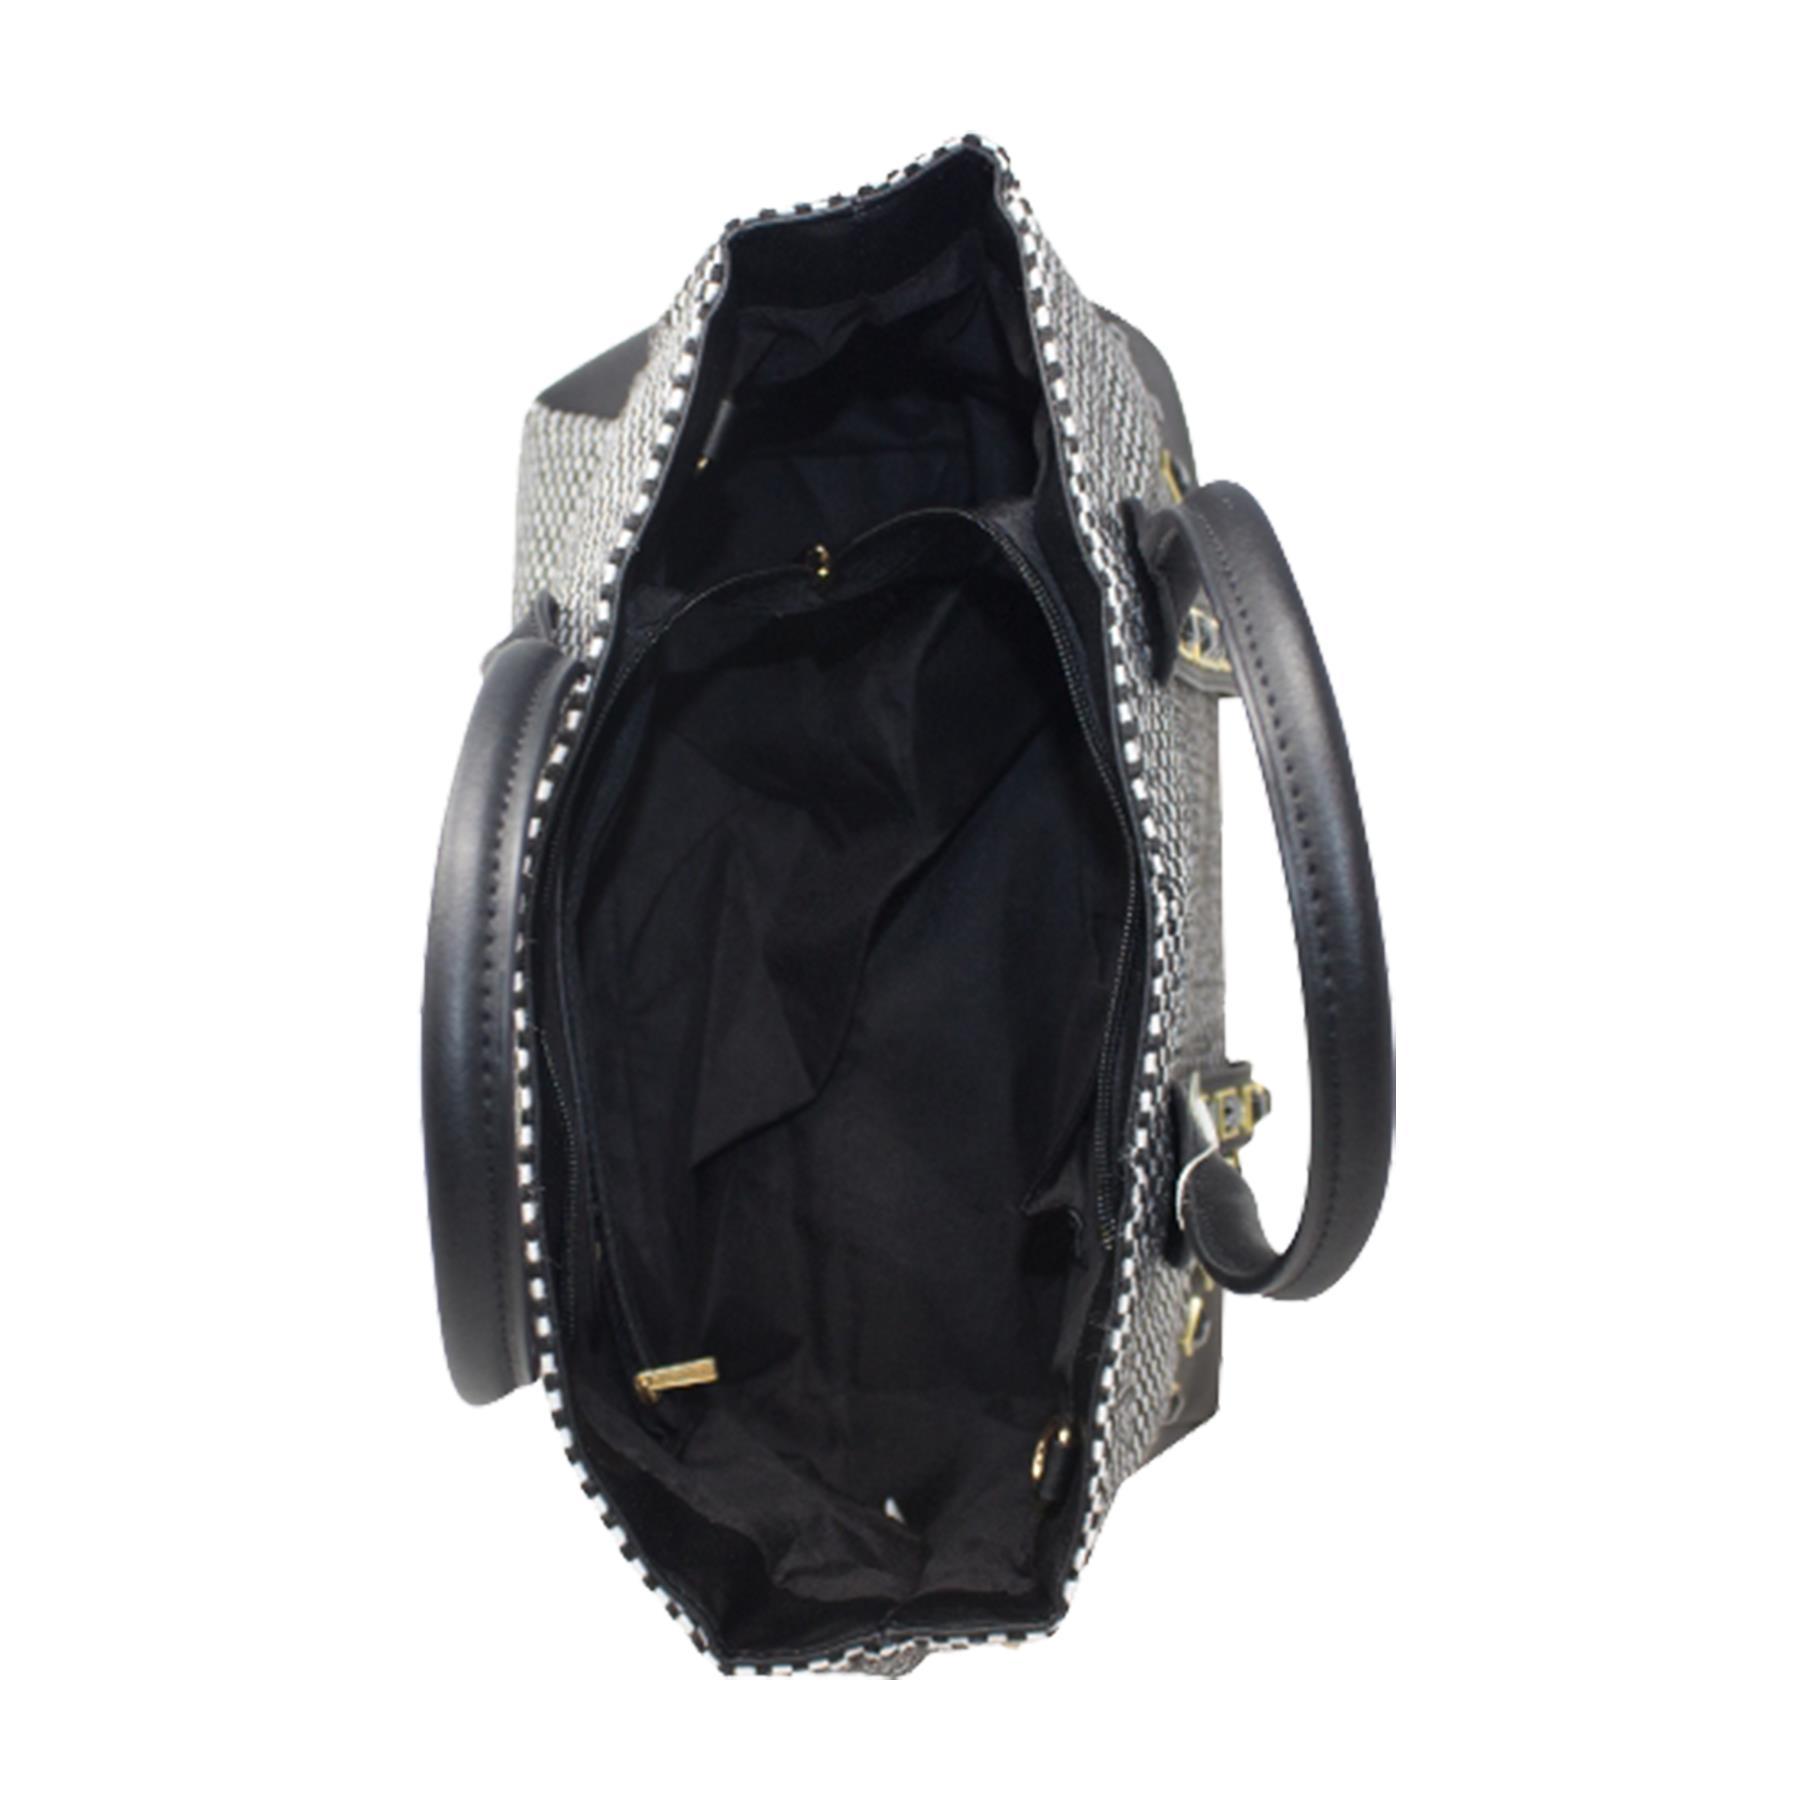 New-Women-s-Small-Check-Pattern-Studded-Design-Tote-Bag-Handbag thumbnail 7